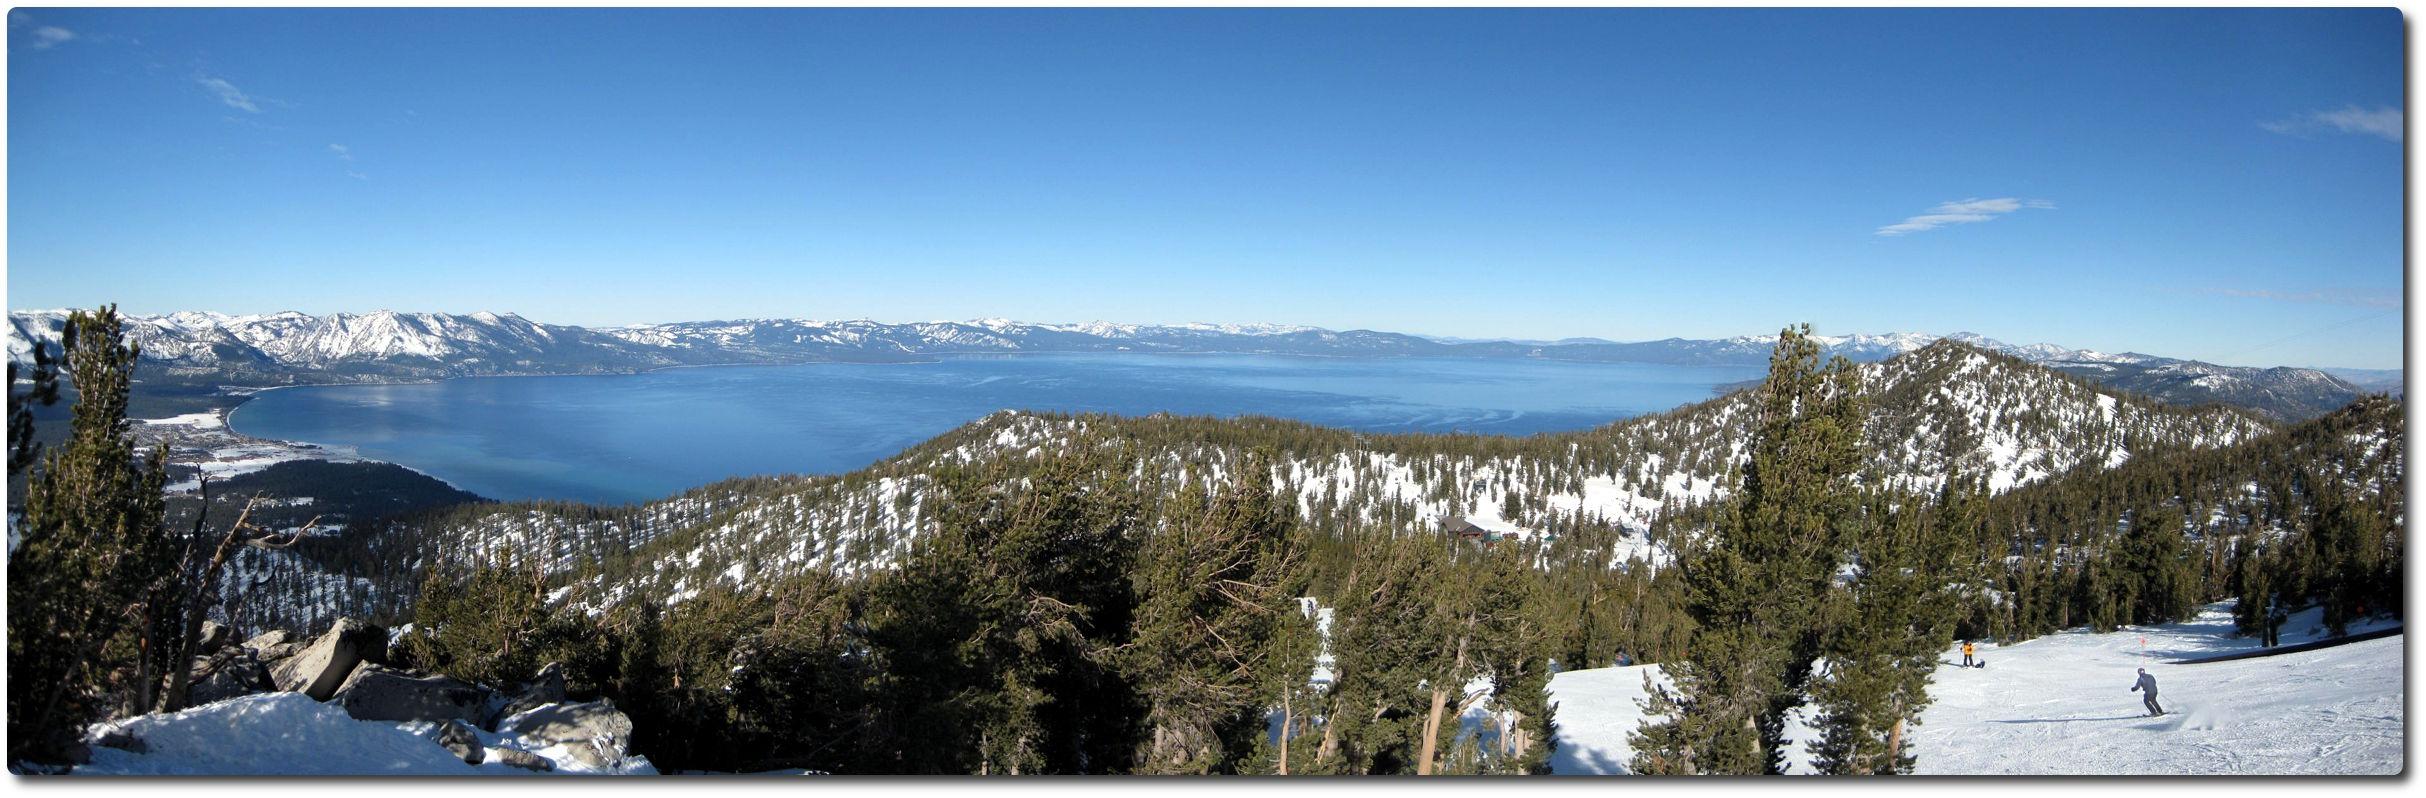 Panorama Lake Tahoe - Januar 2009